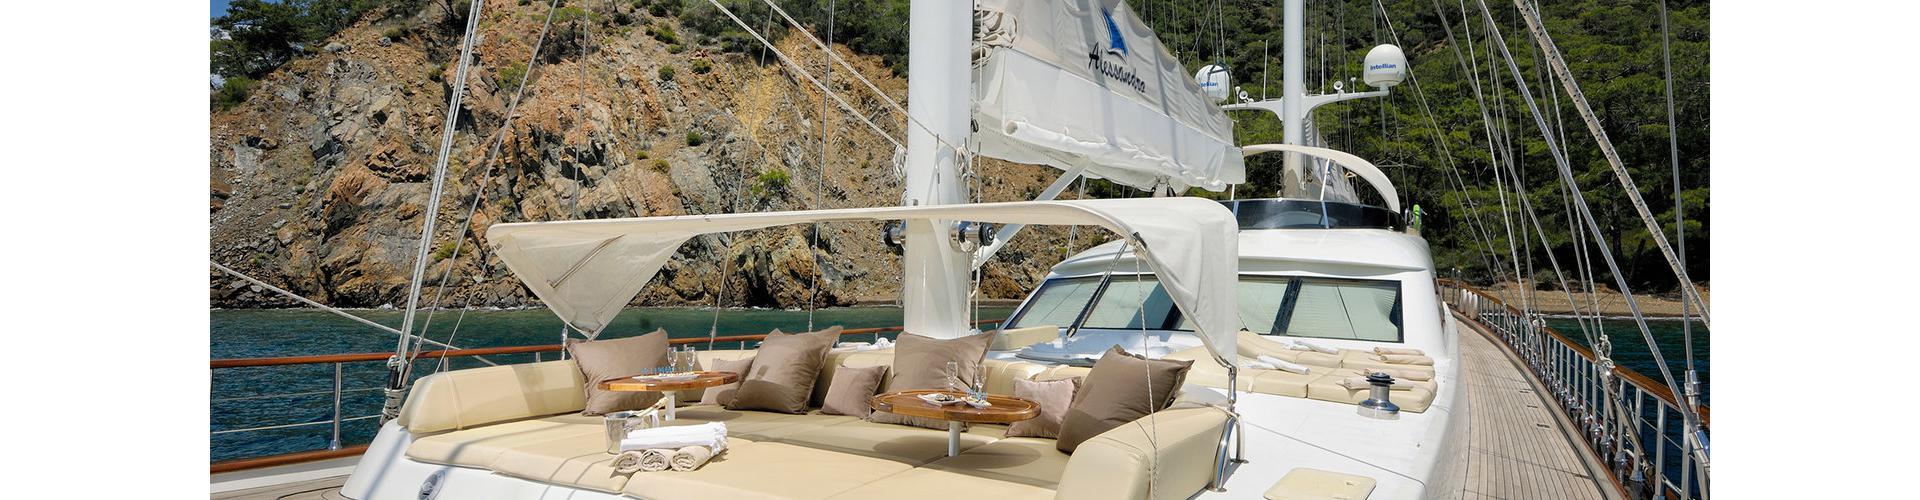 motor sailer Alessandro